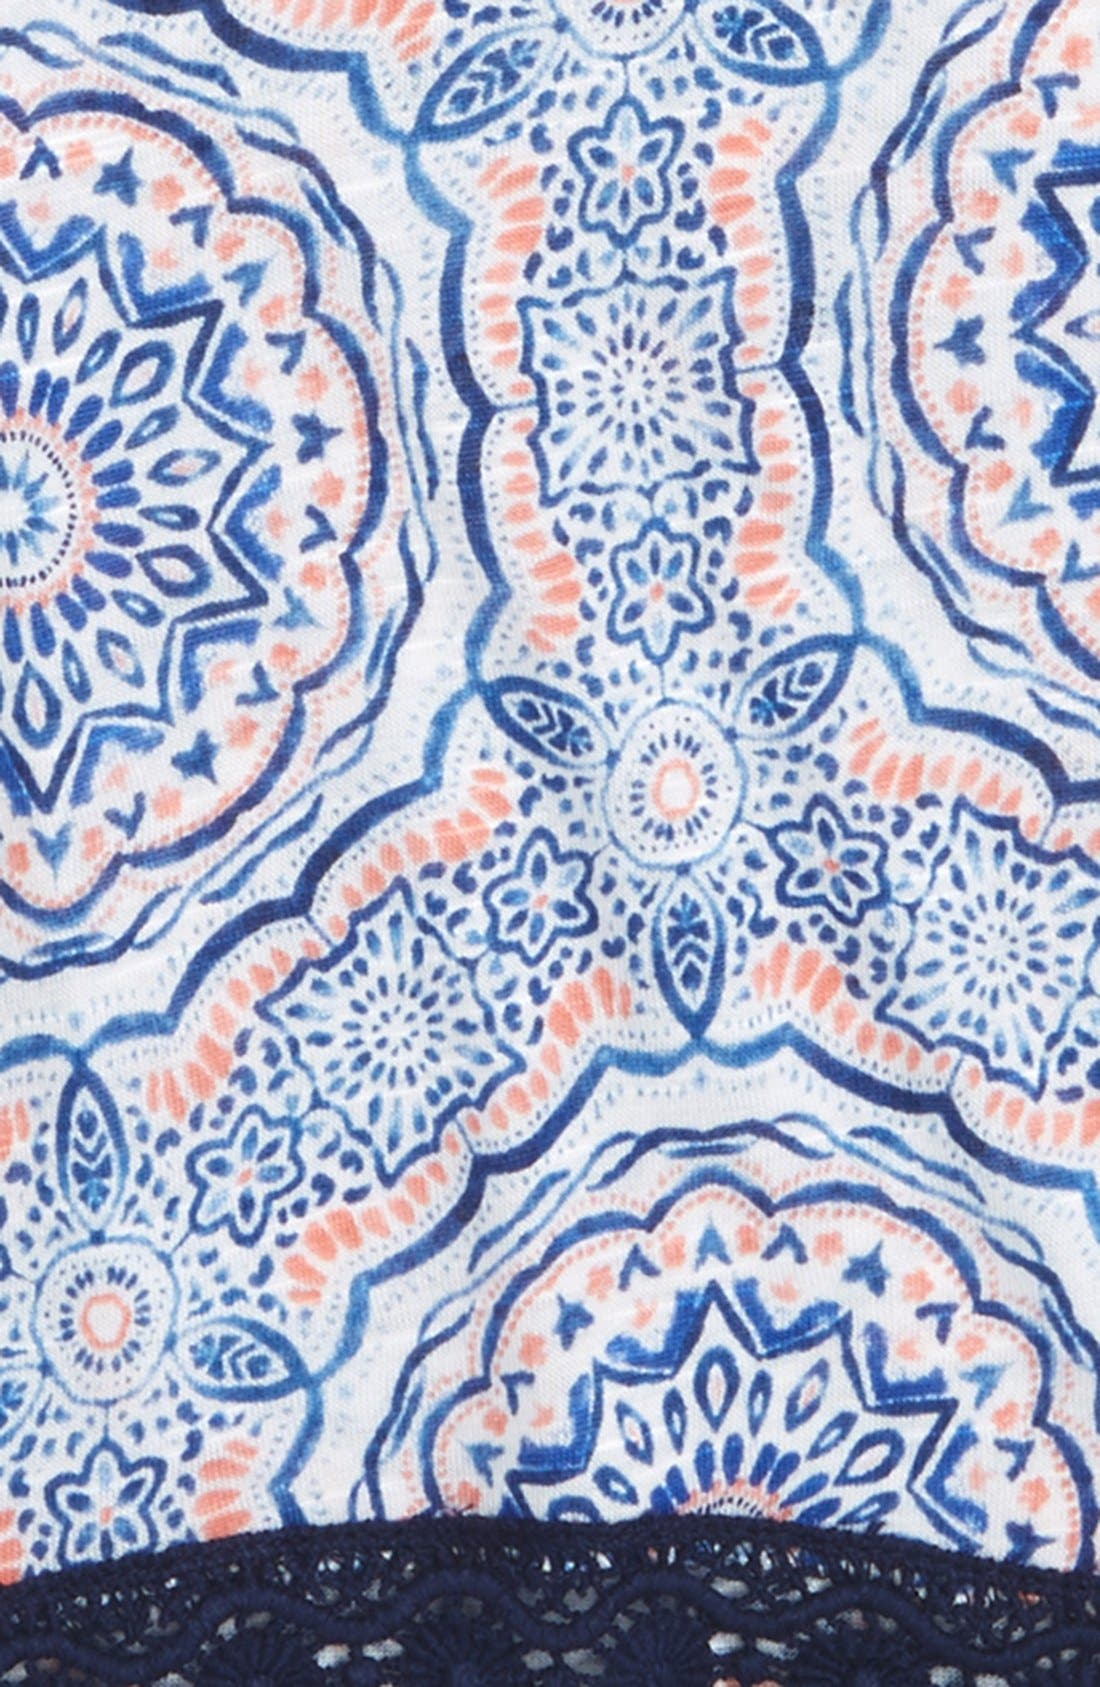 Print Crochet Trim Tee,                             Alternate thumbnail 2, color,                             Coral